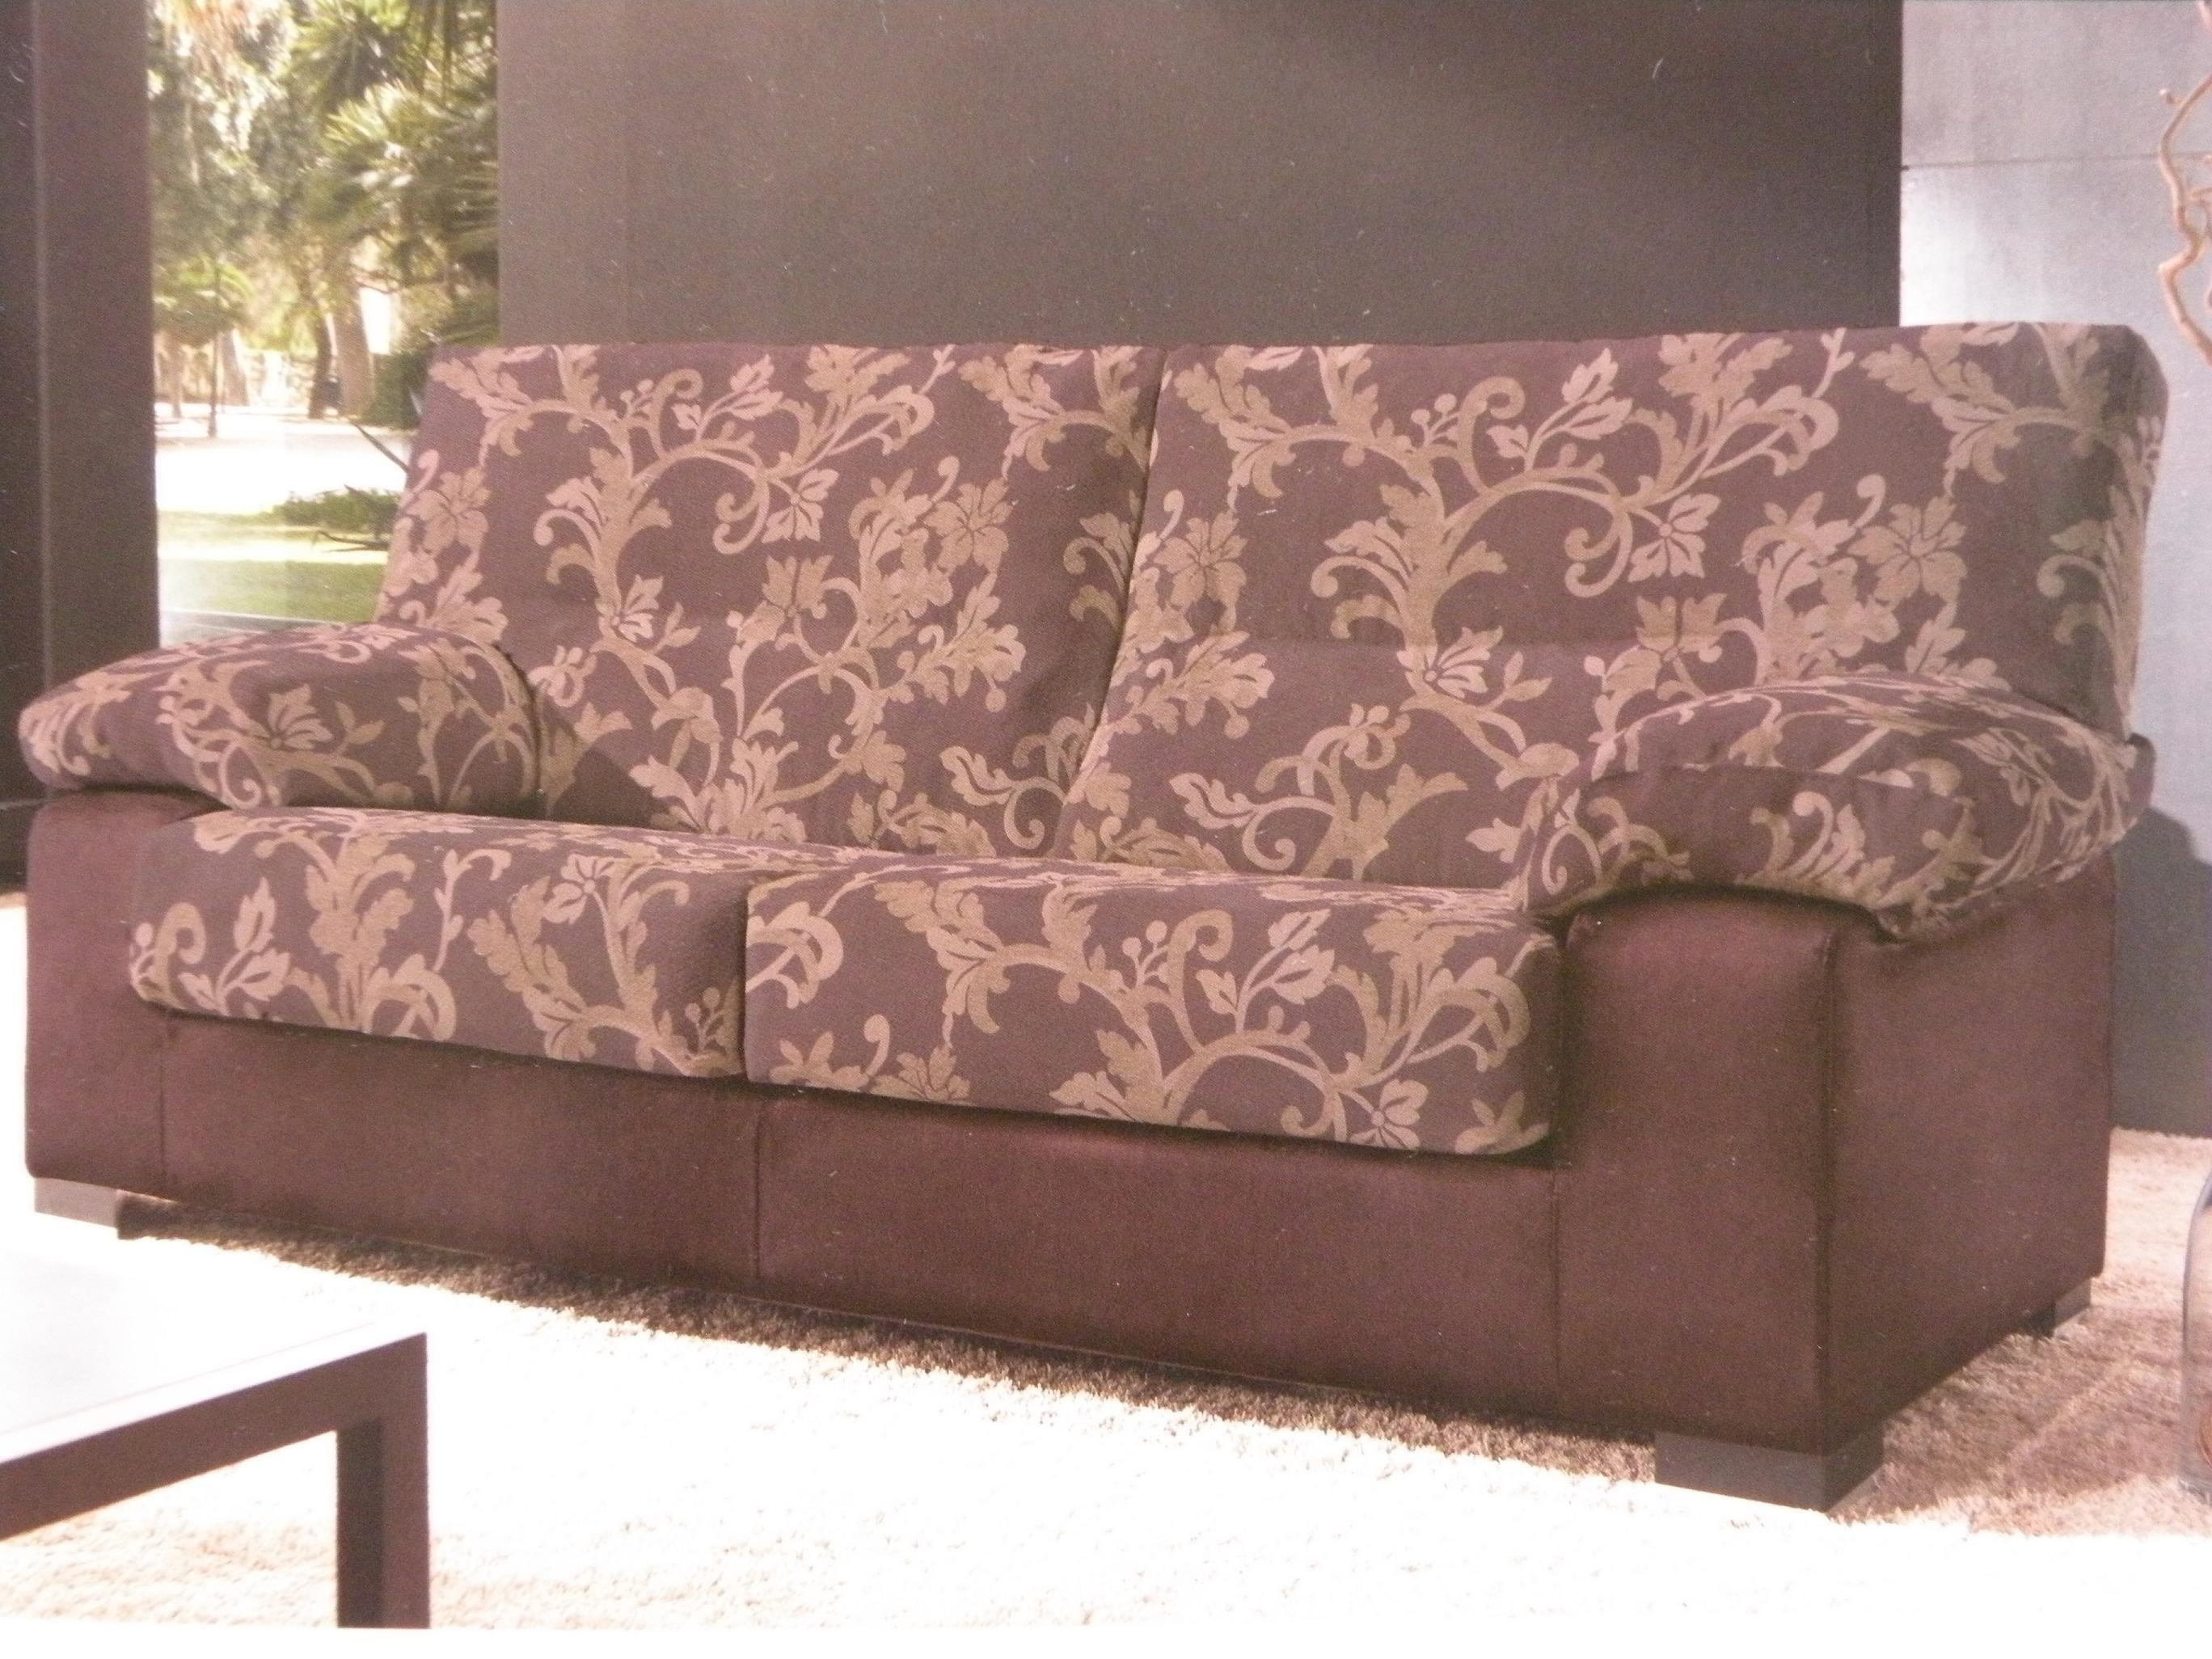 Canapea Brownie Home decor, Decor, Couch